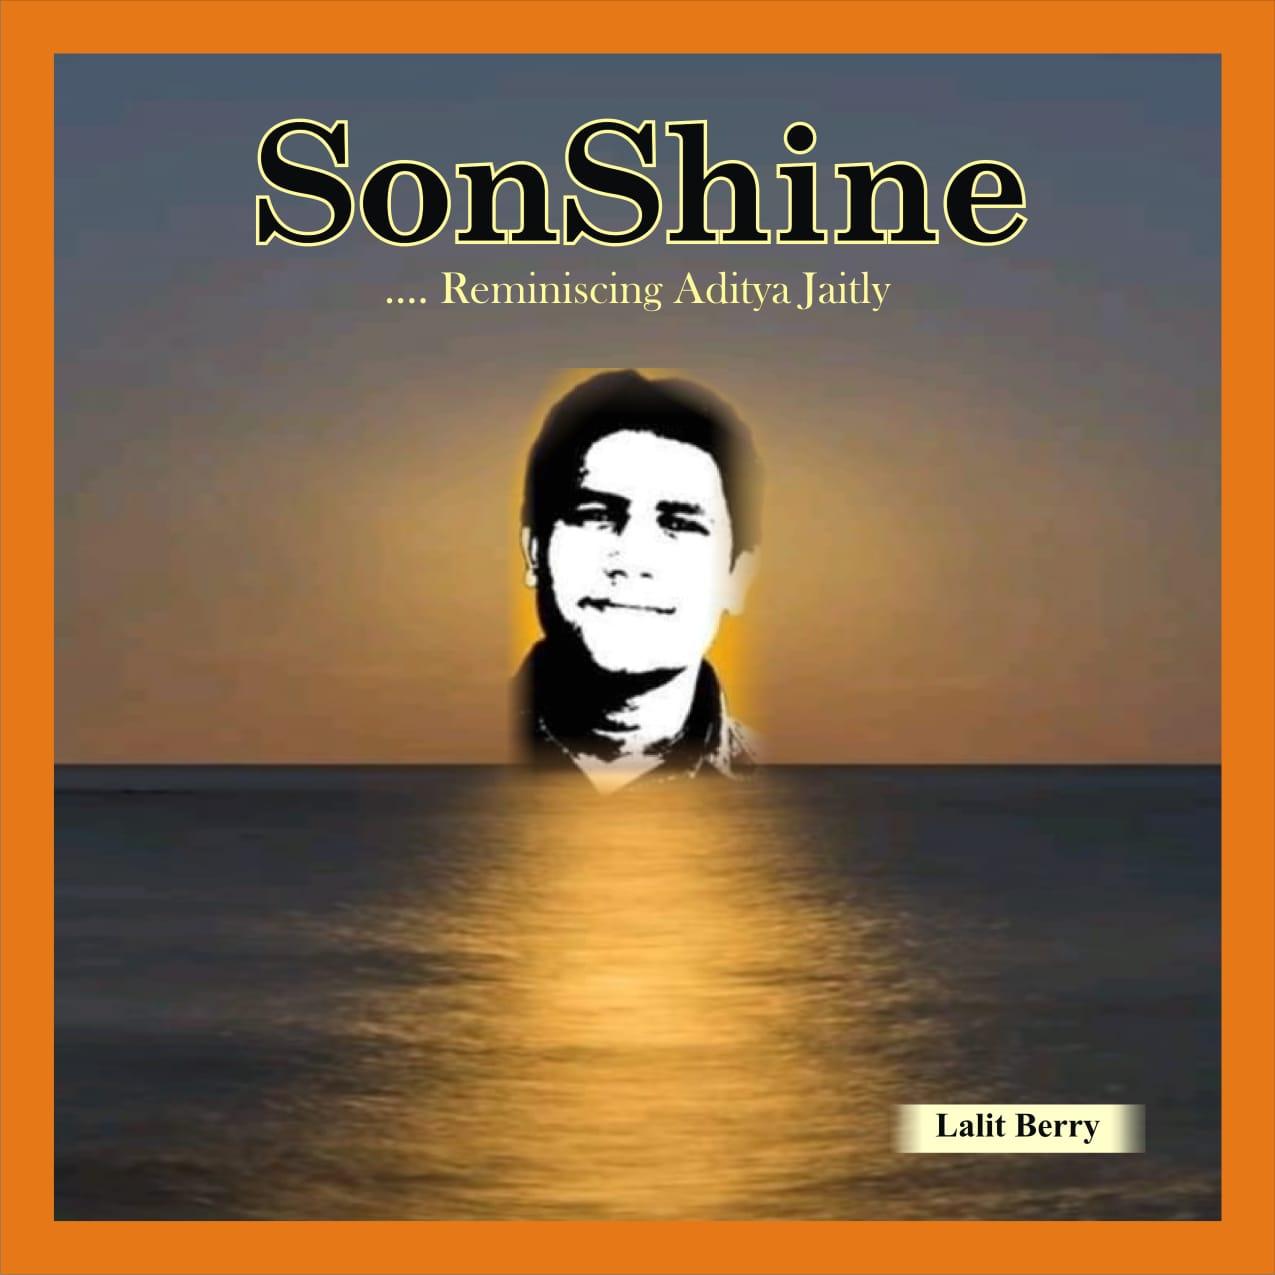 Son Shine (Reminiscing Aditya Jaitly) by Lalit Berry